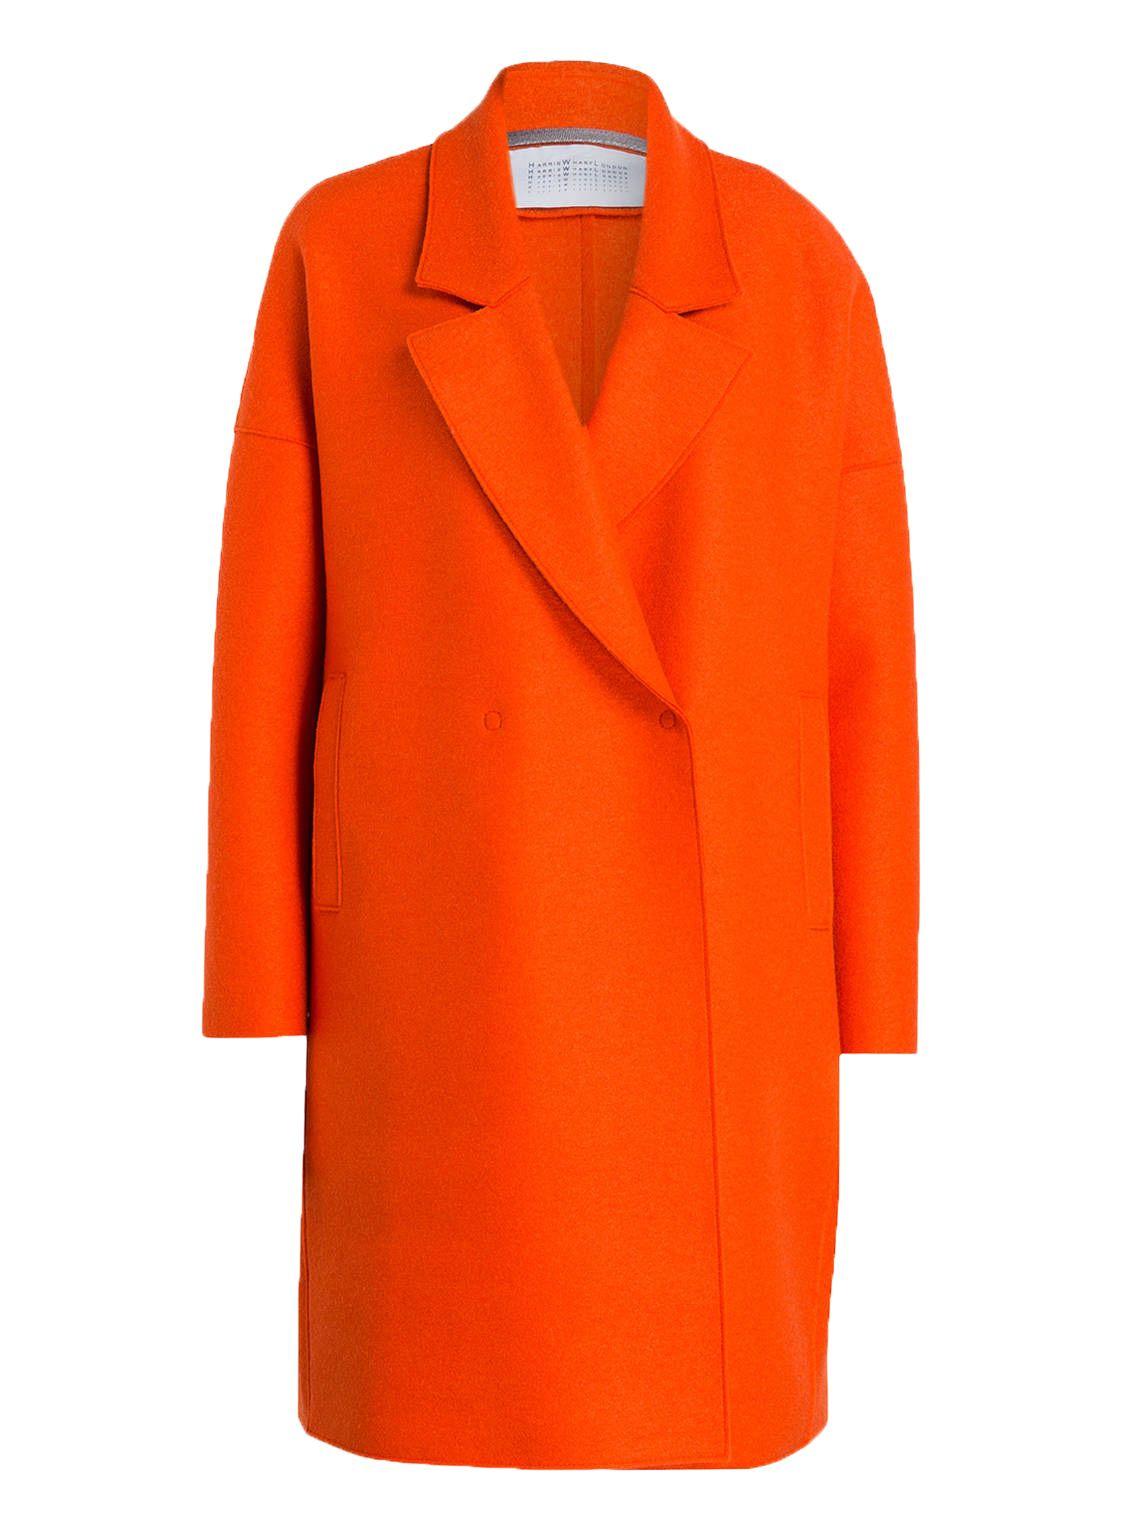 Shoppe Hier Die Schonsten Bunten Mantel Im Sale Mantel Jacke Langer Mantel